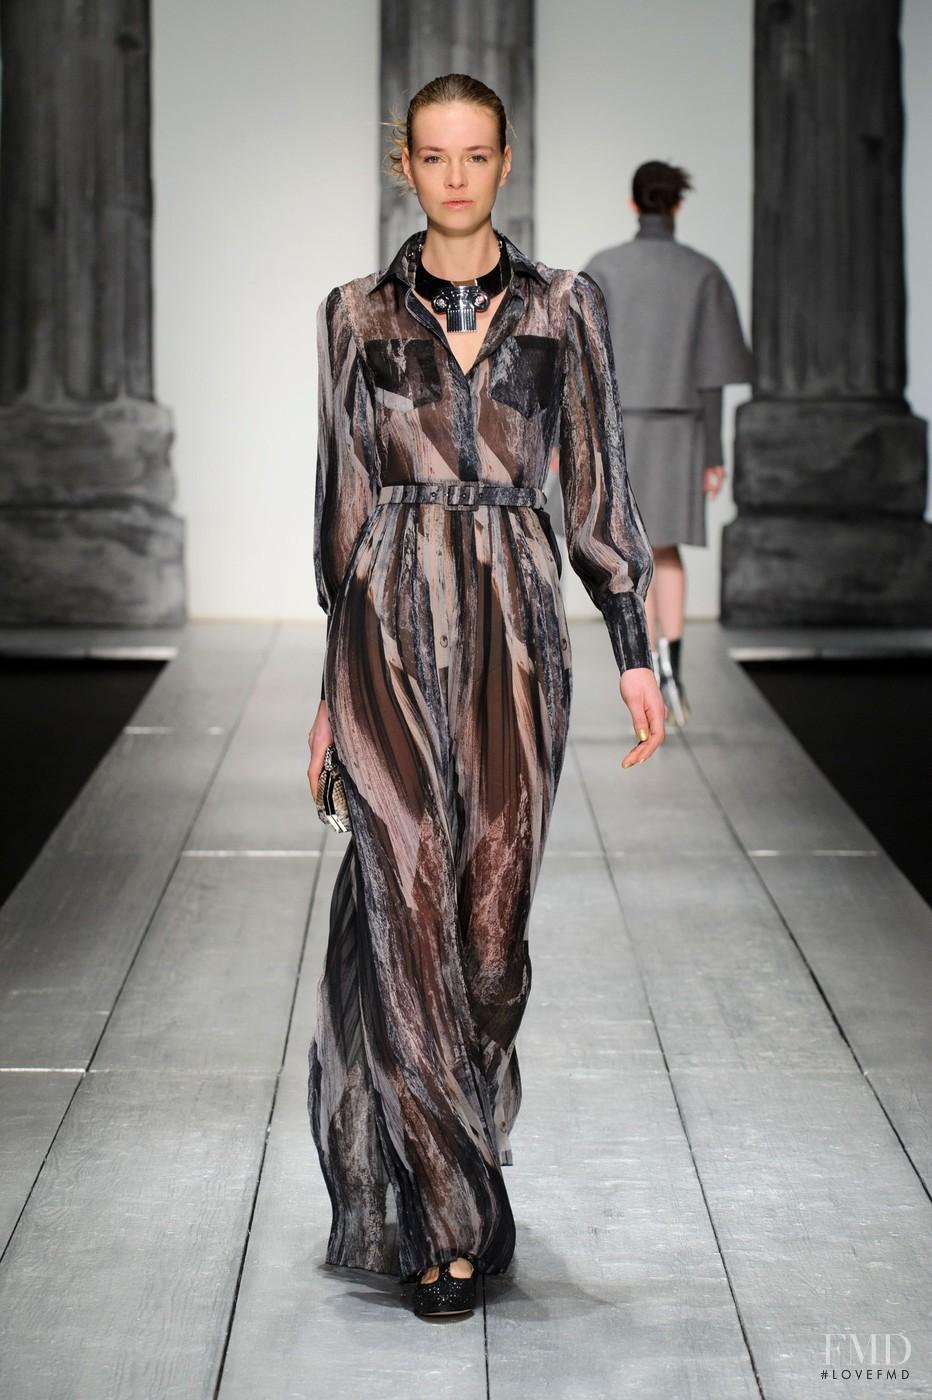 The sensational history of Italian fashion - A Fashion History Laura biagiotti fashion designer